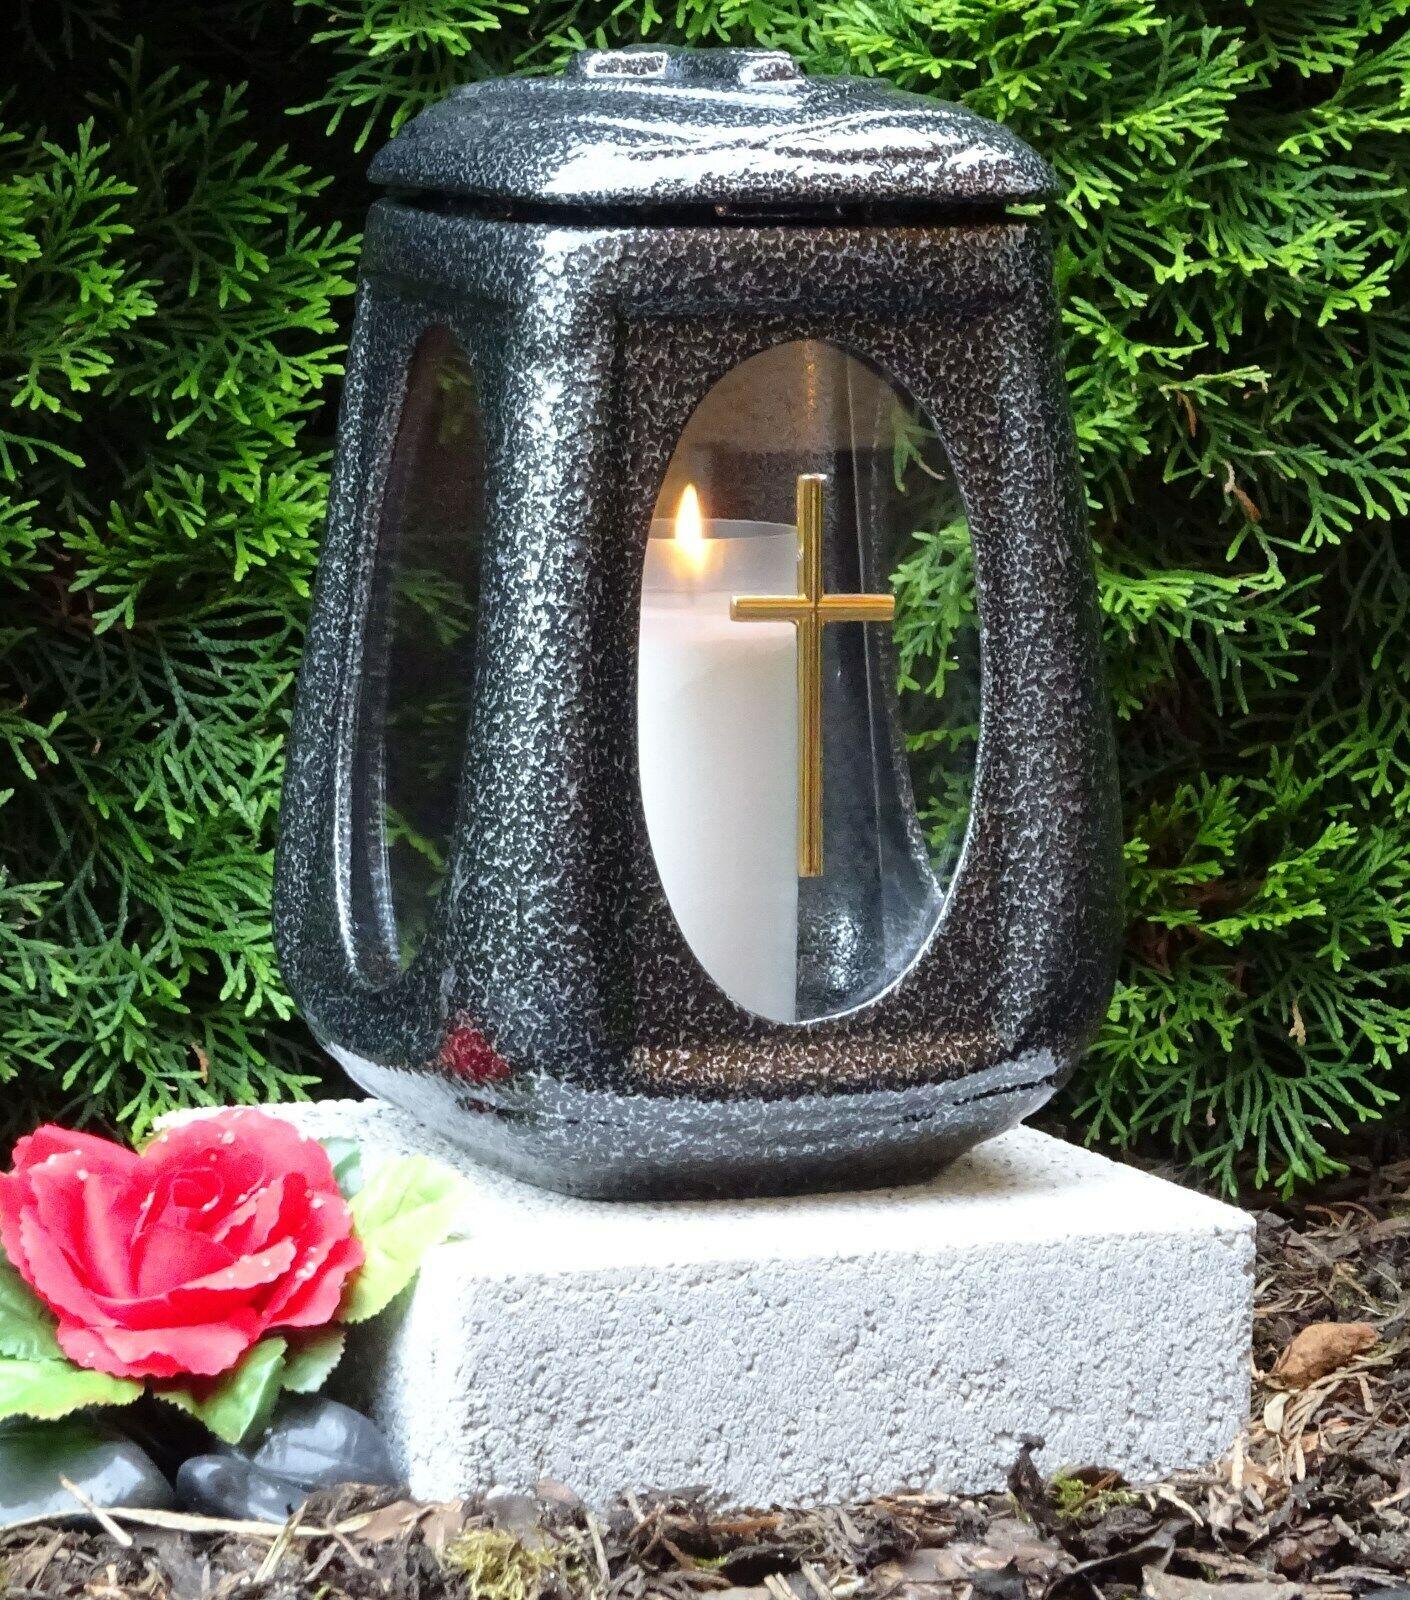 Linterna grave con base lámpara grave grave grave luz corazón grave decoraciones vela